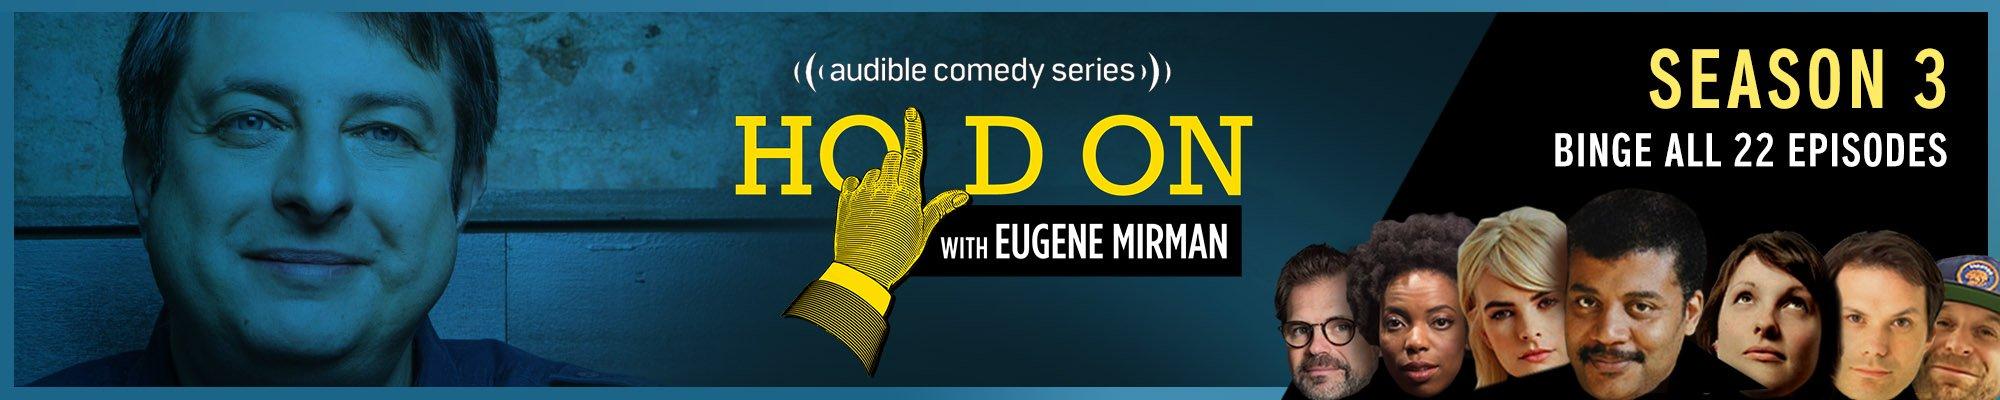 Binge Season 3 of Hold On with Eugene Mirman!